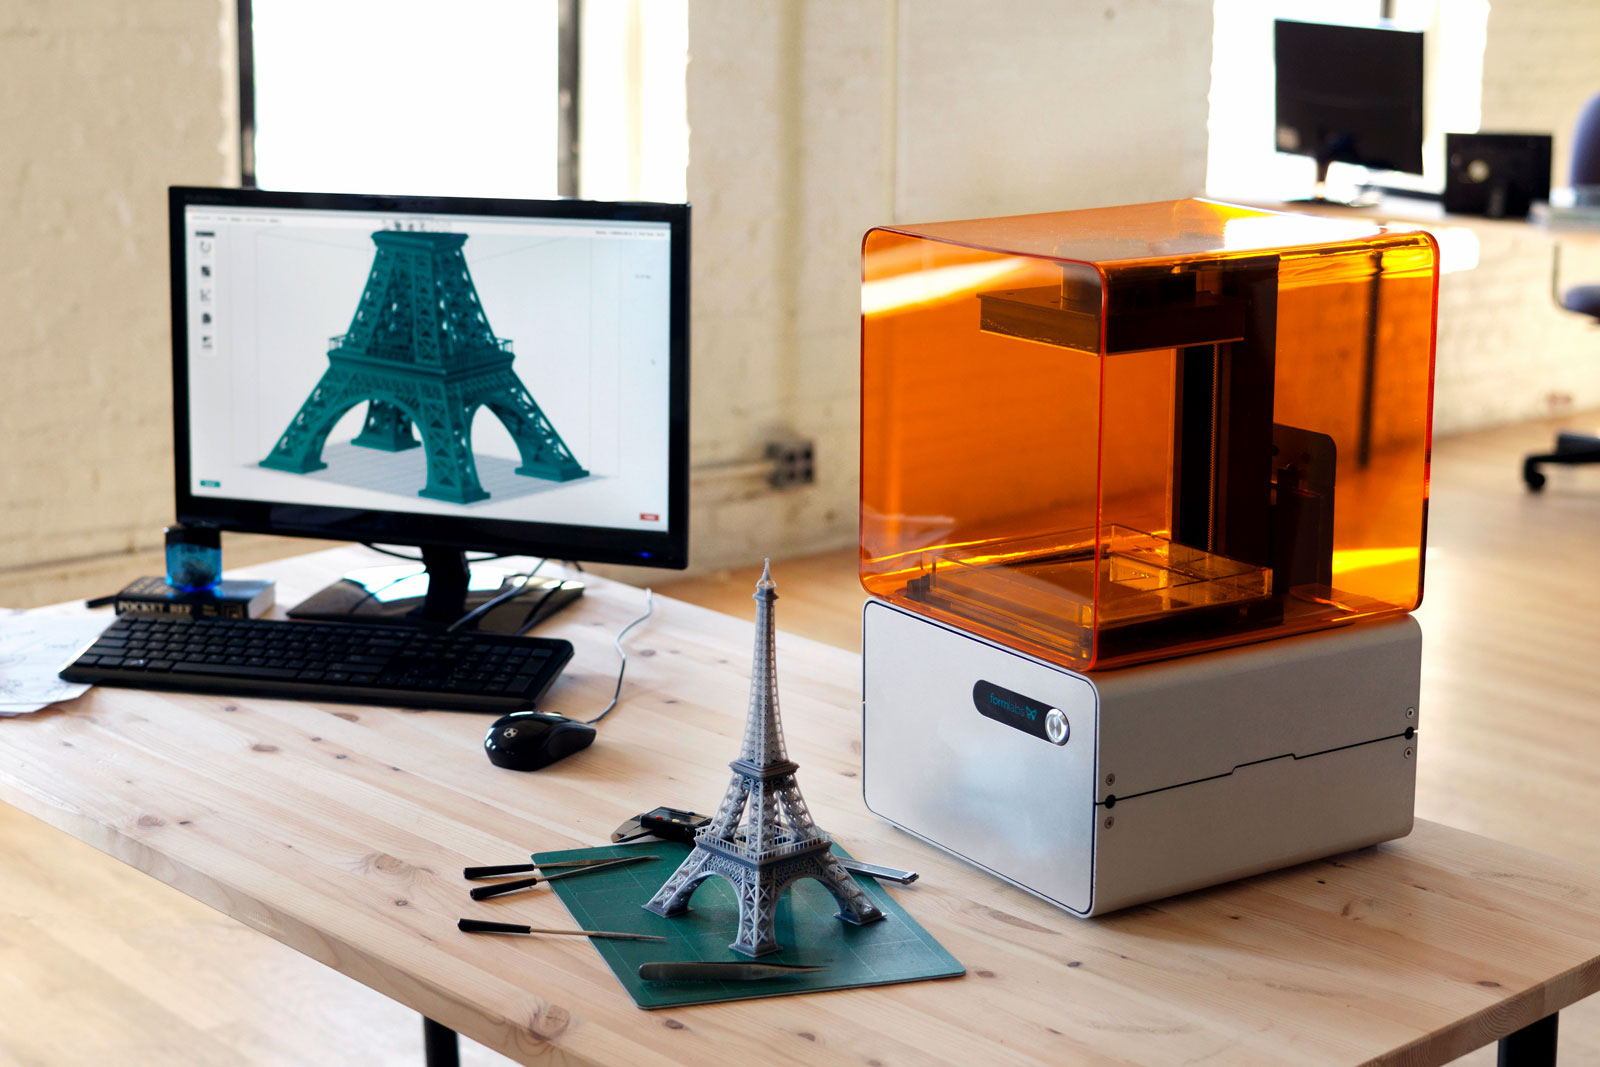 mojasame technology1 - تاثیر تکنولوژی بر مواد و ابزار مجسمه سازی